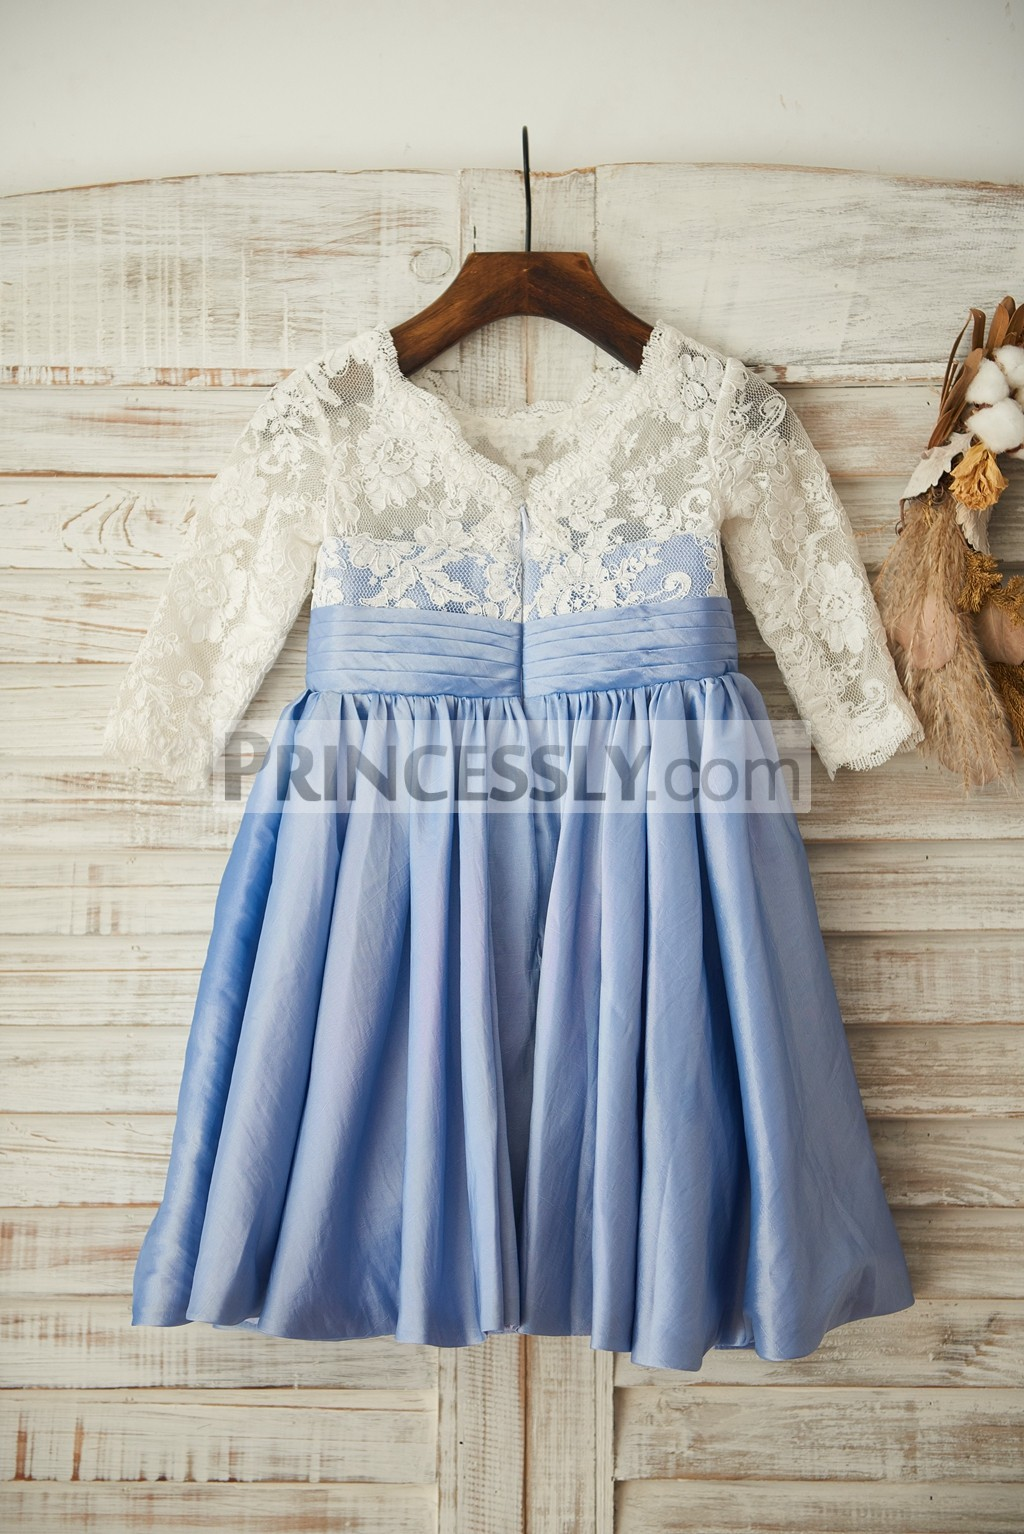 Ivory lace blue taffeta wedding baby girl dress